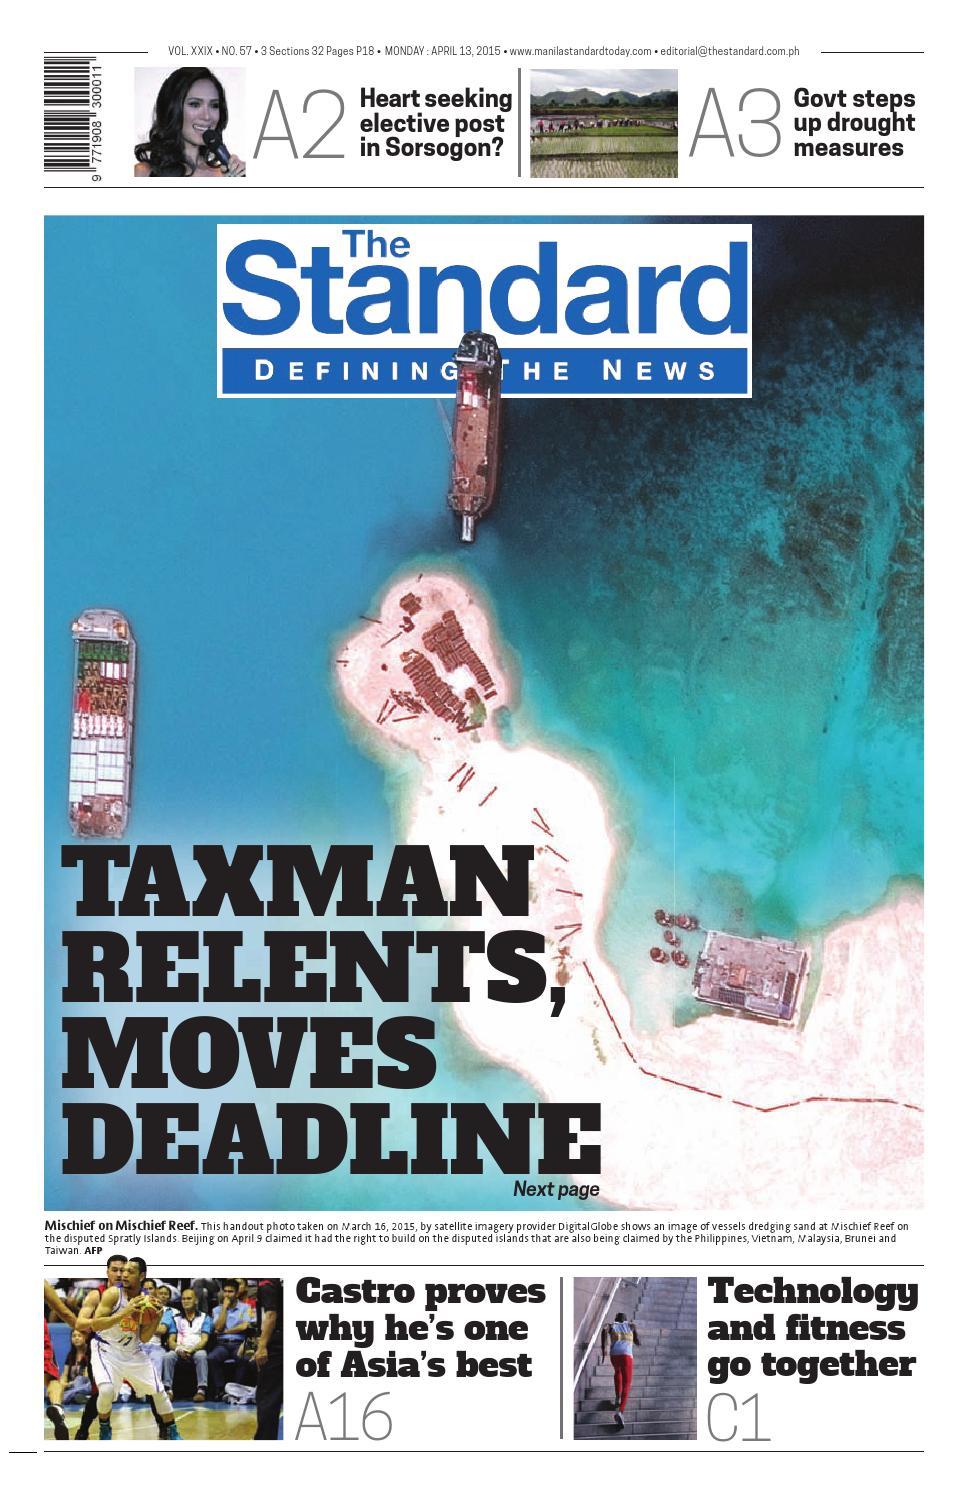 The Standard - 2015 April 13 - Monday by Manila Standard - issuu